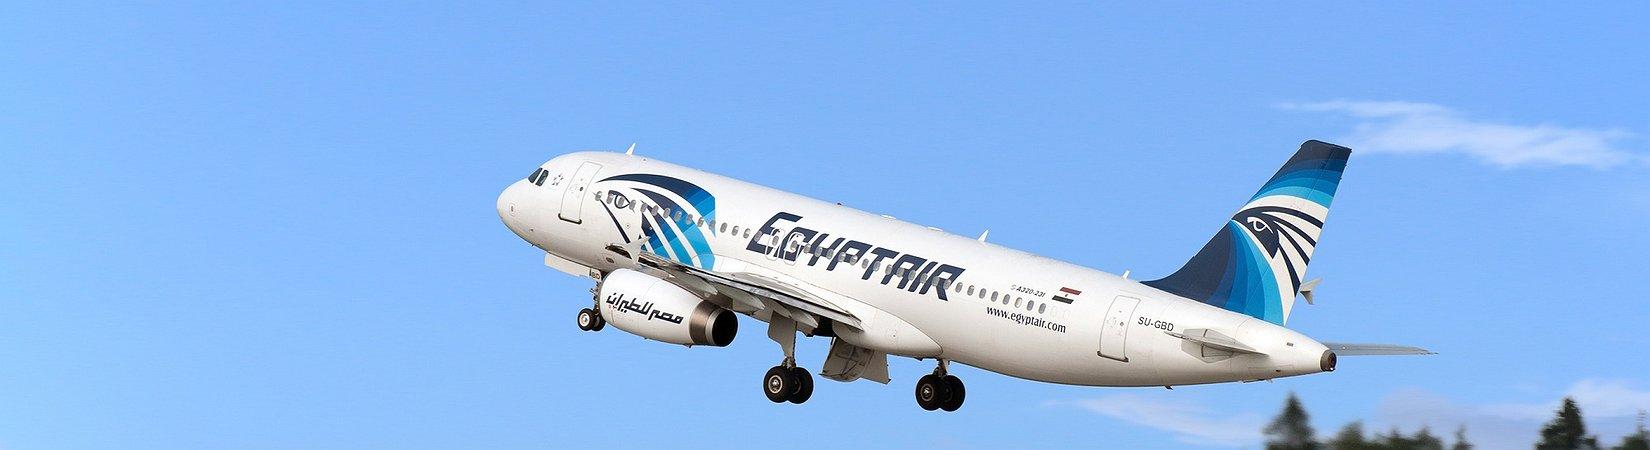 Flugzeug verschwunden - 66 Menschen an Bord